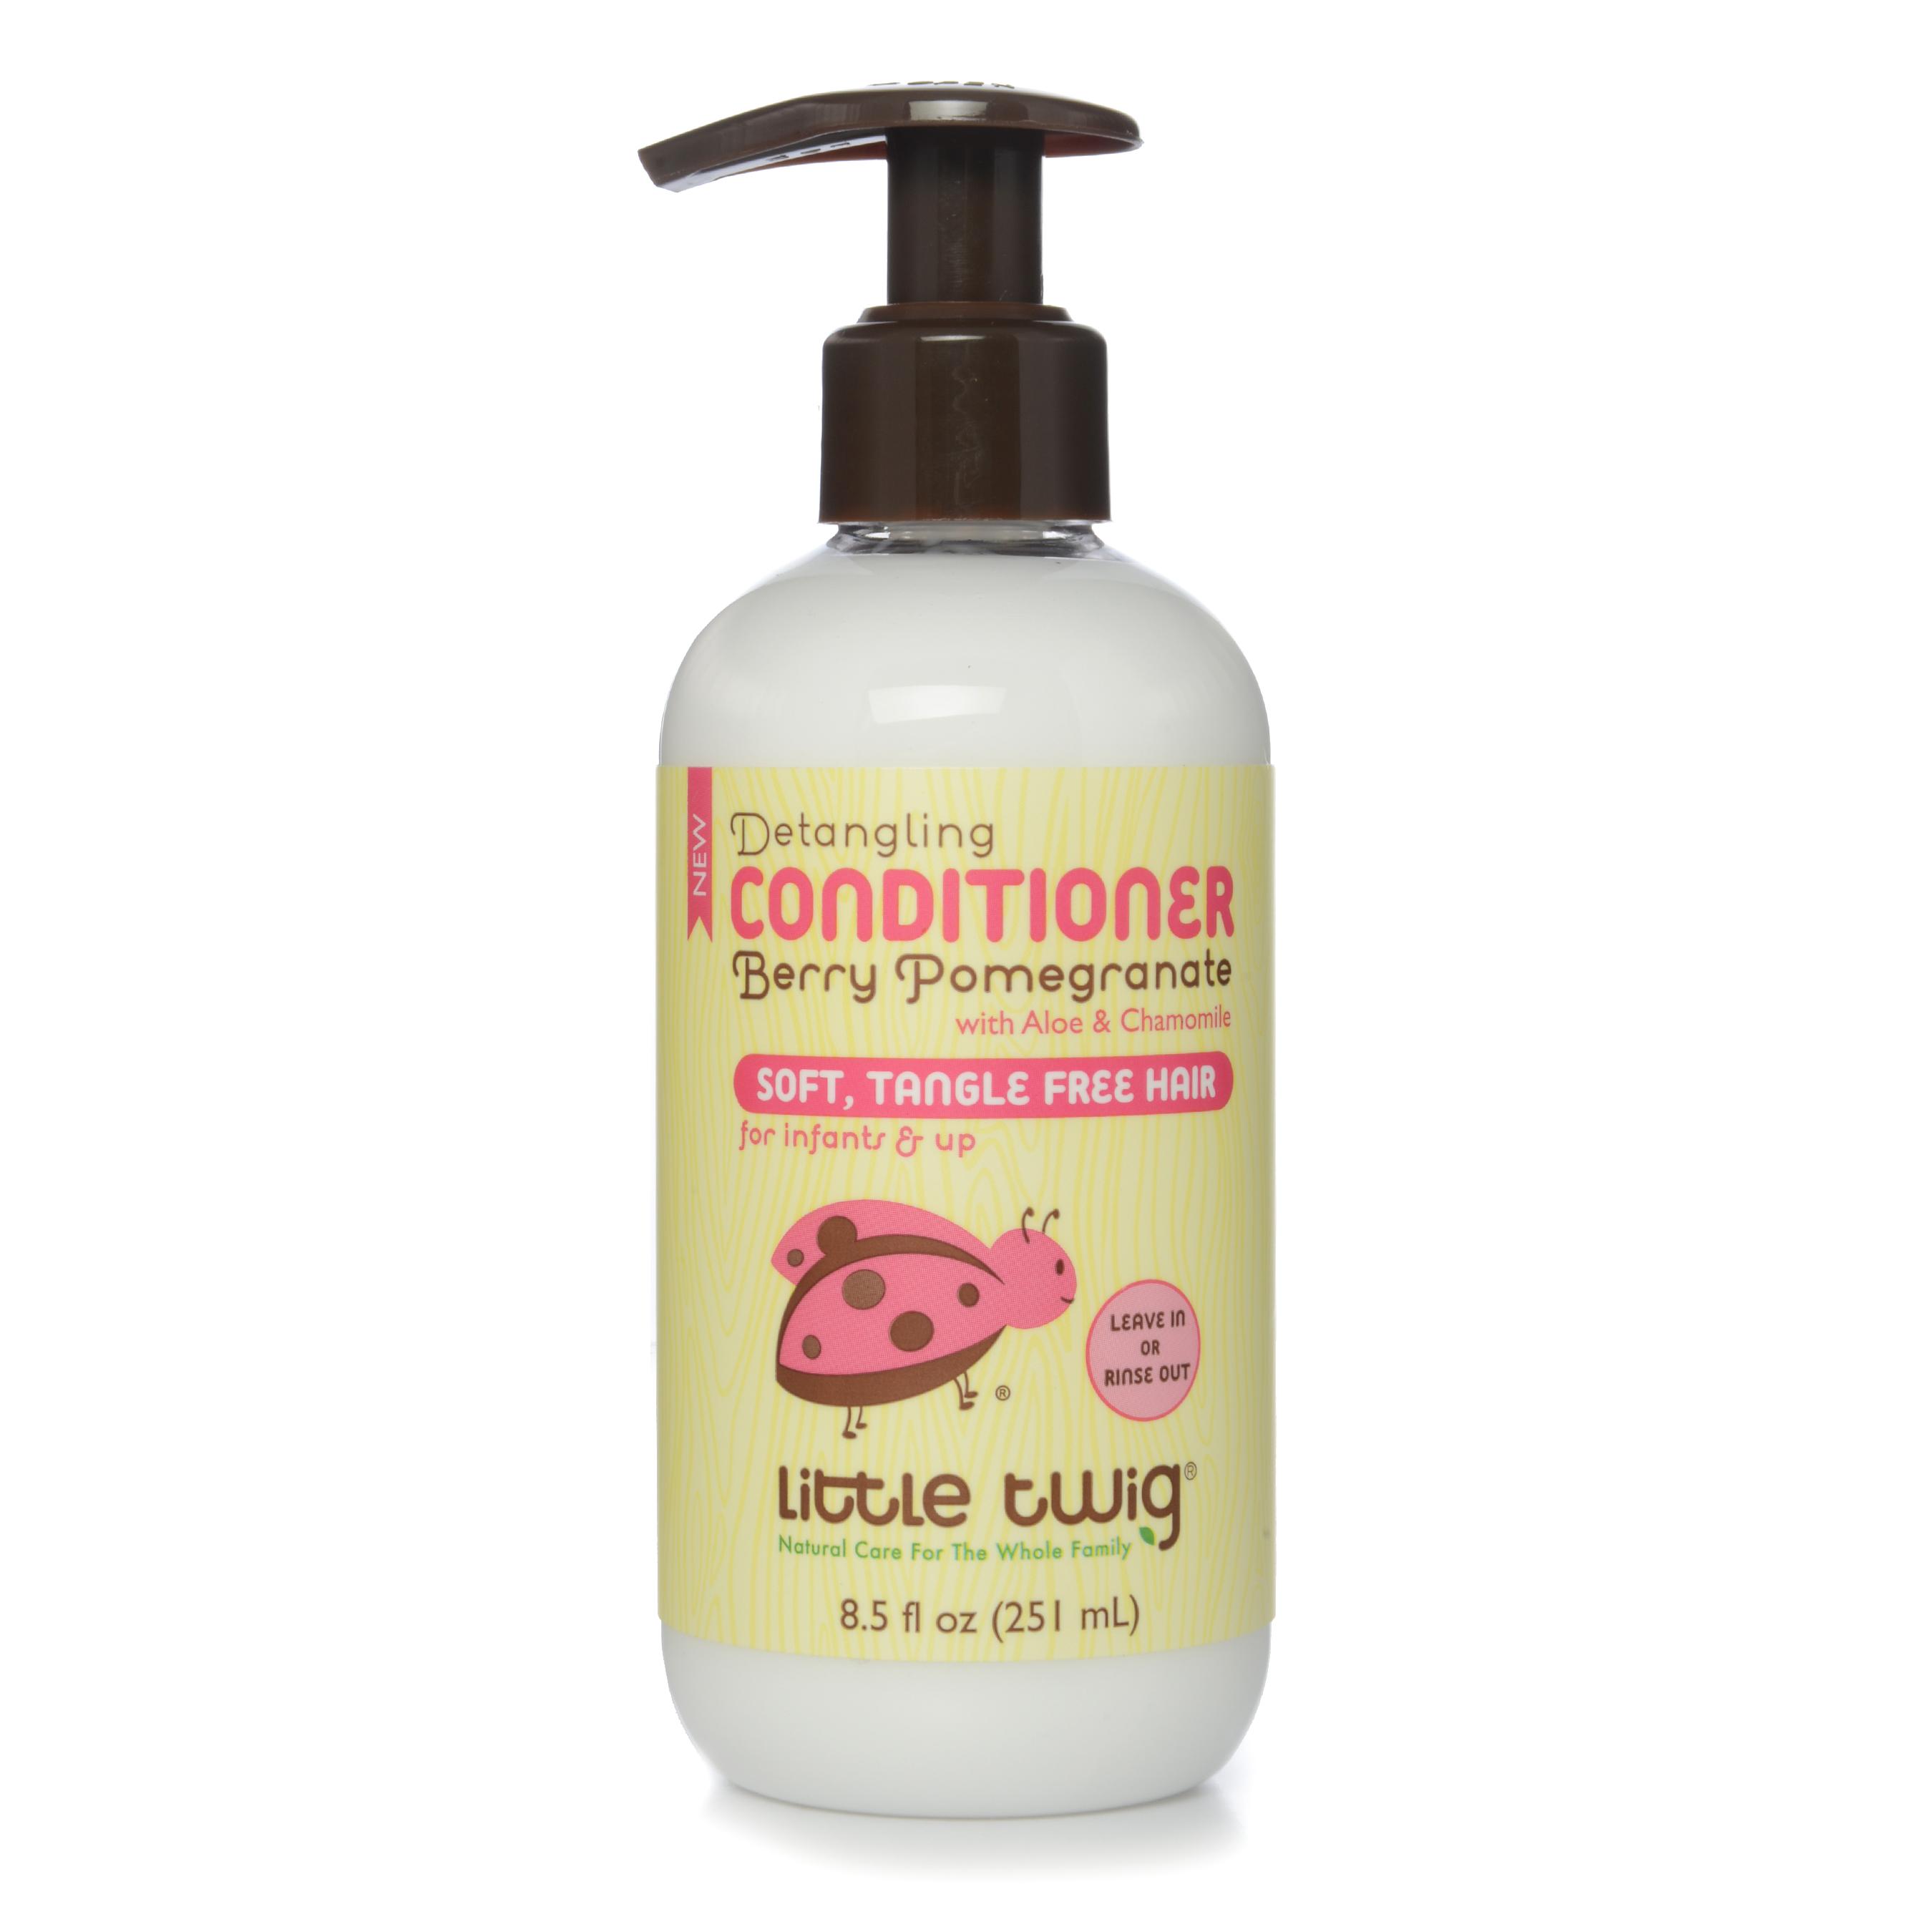 Detangler Products Skin Deep Cosmetics Database Ewg Pantene Shampoo Pro V Hair Fall Control 480ml Little Twig Detangling Conditioner Berry Pomegranate